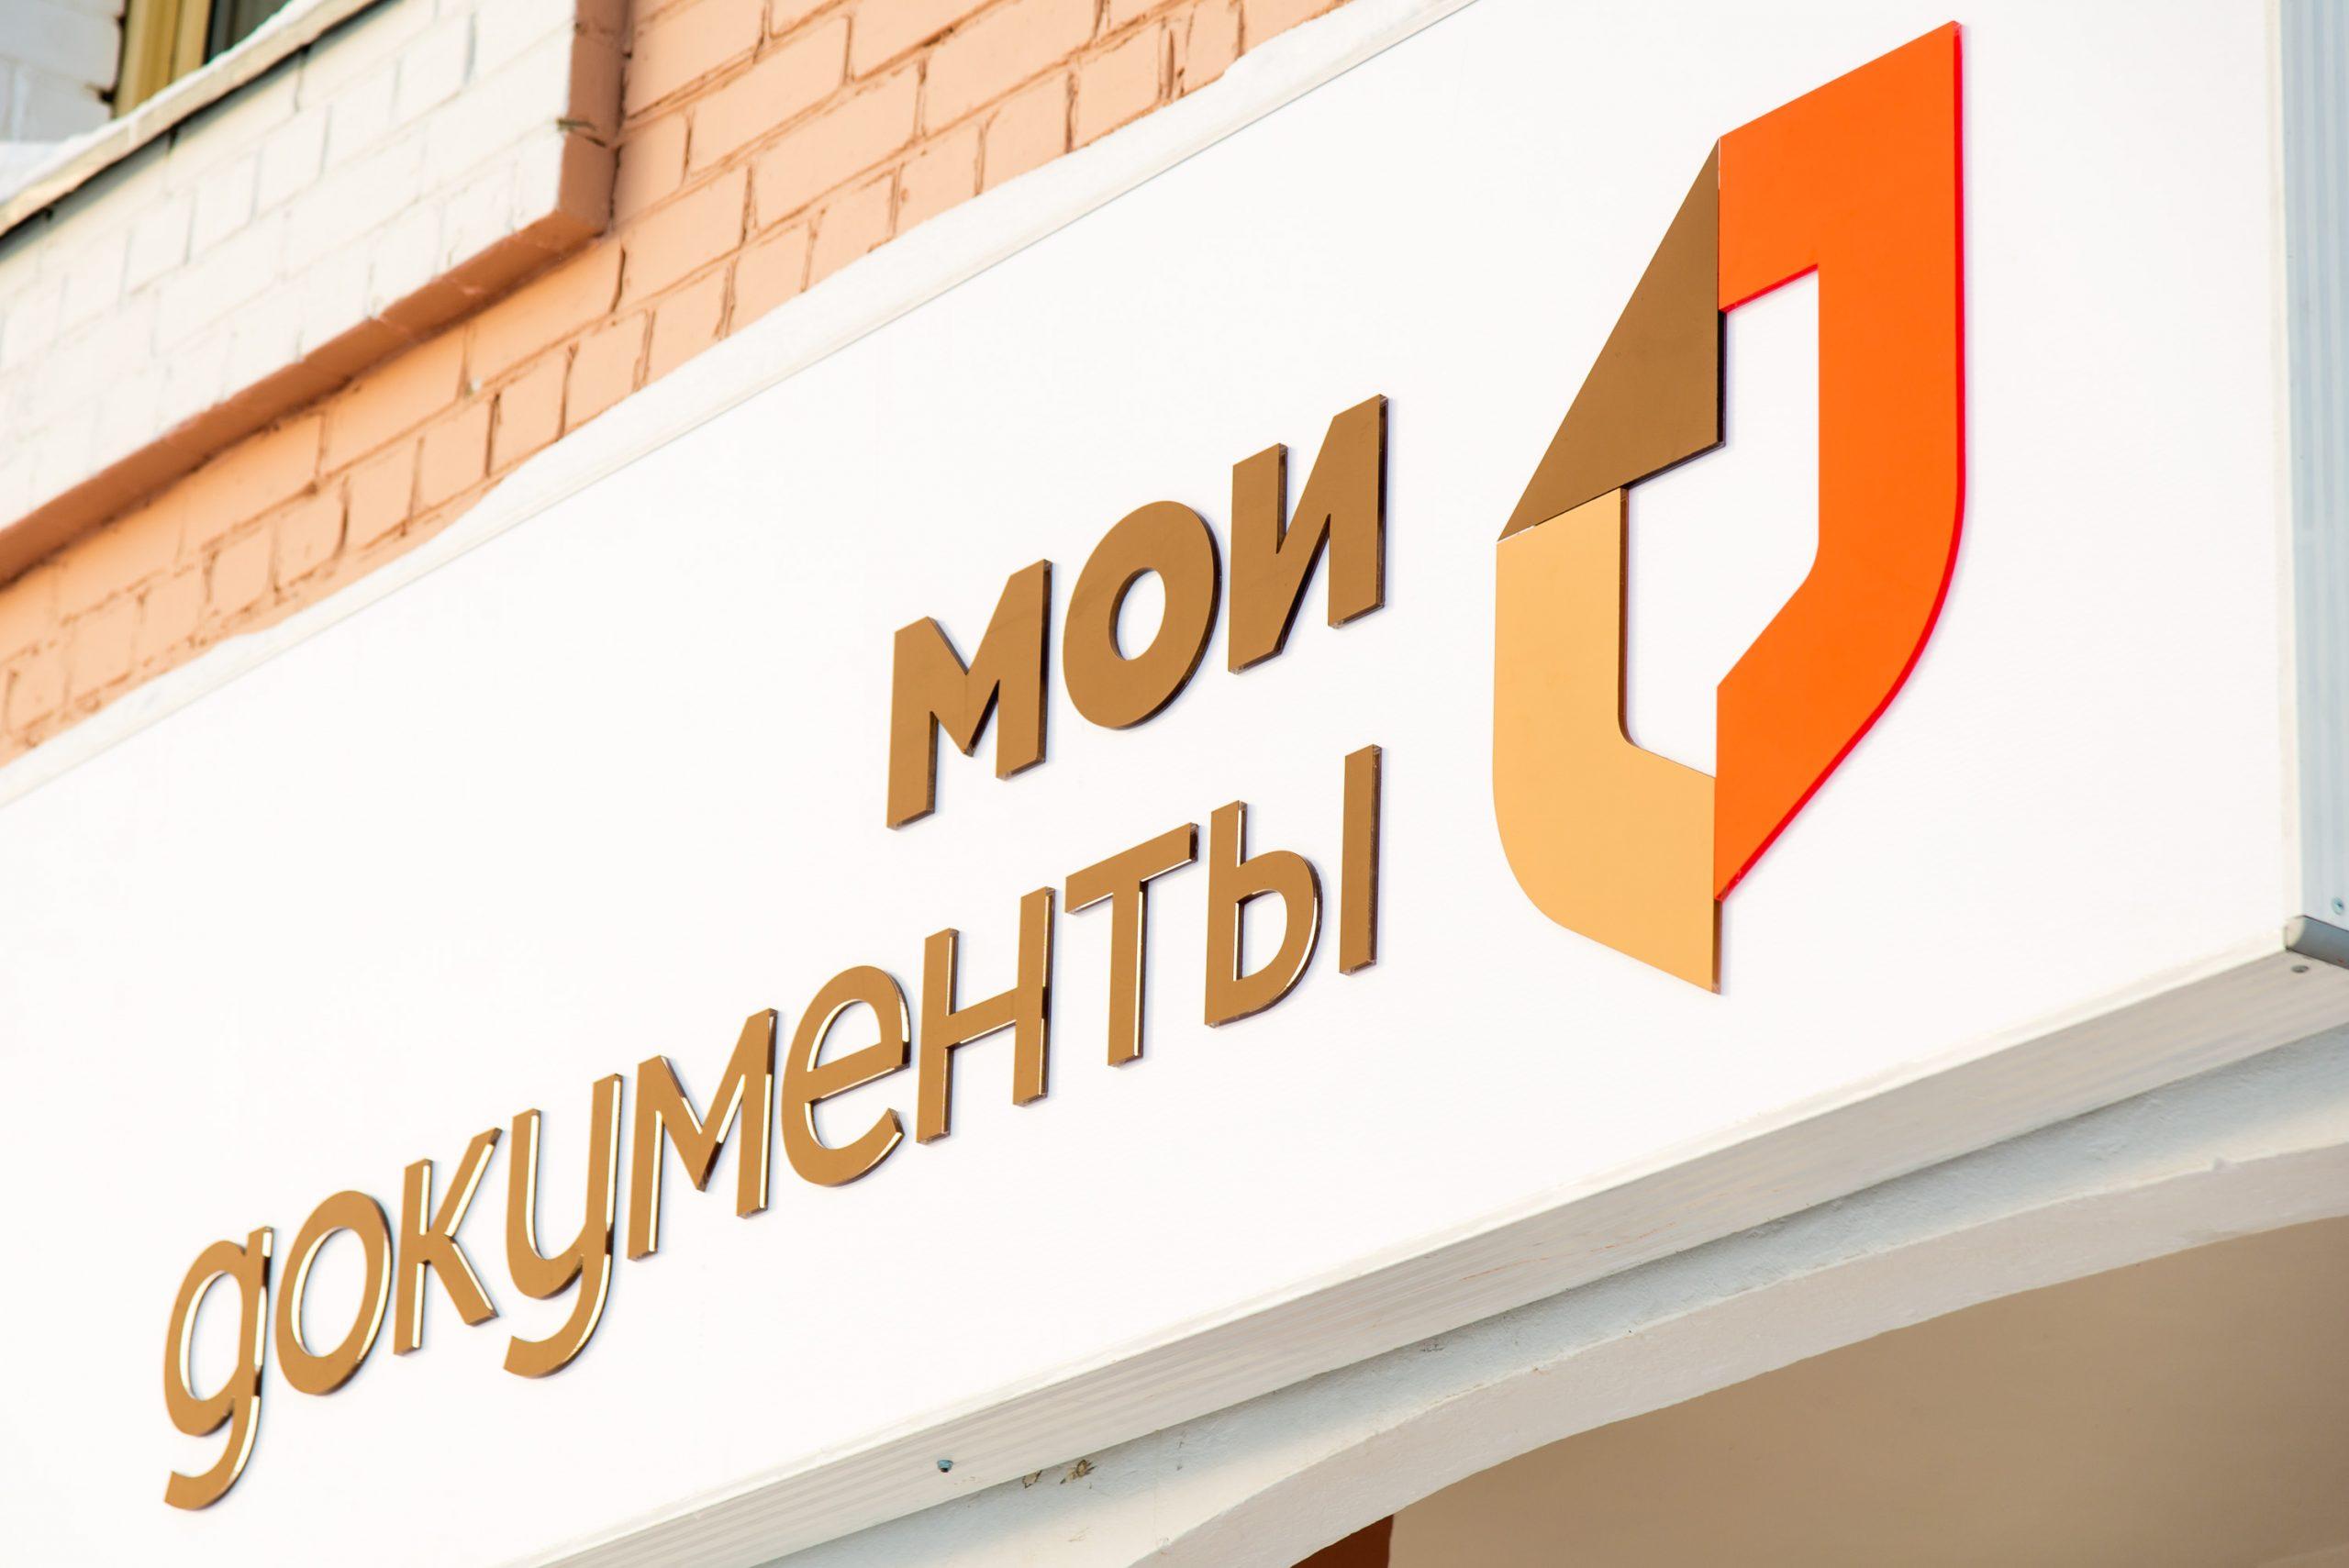 Как будут работать МФЦ на майские праздники в Севастополе